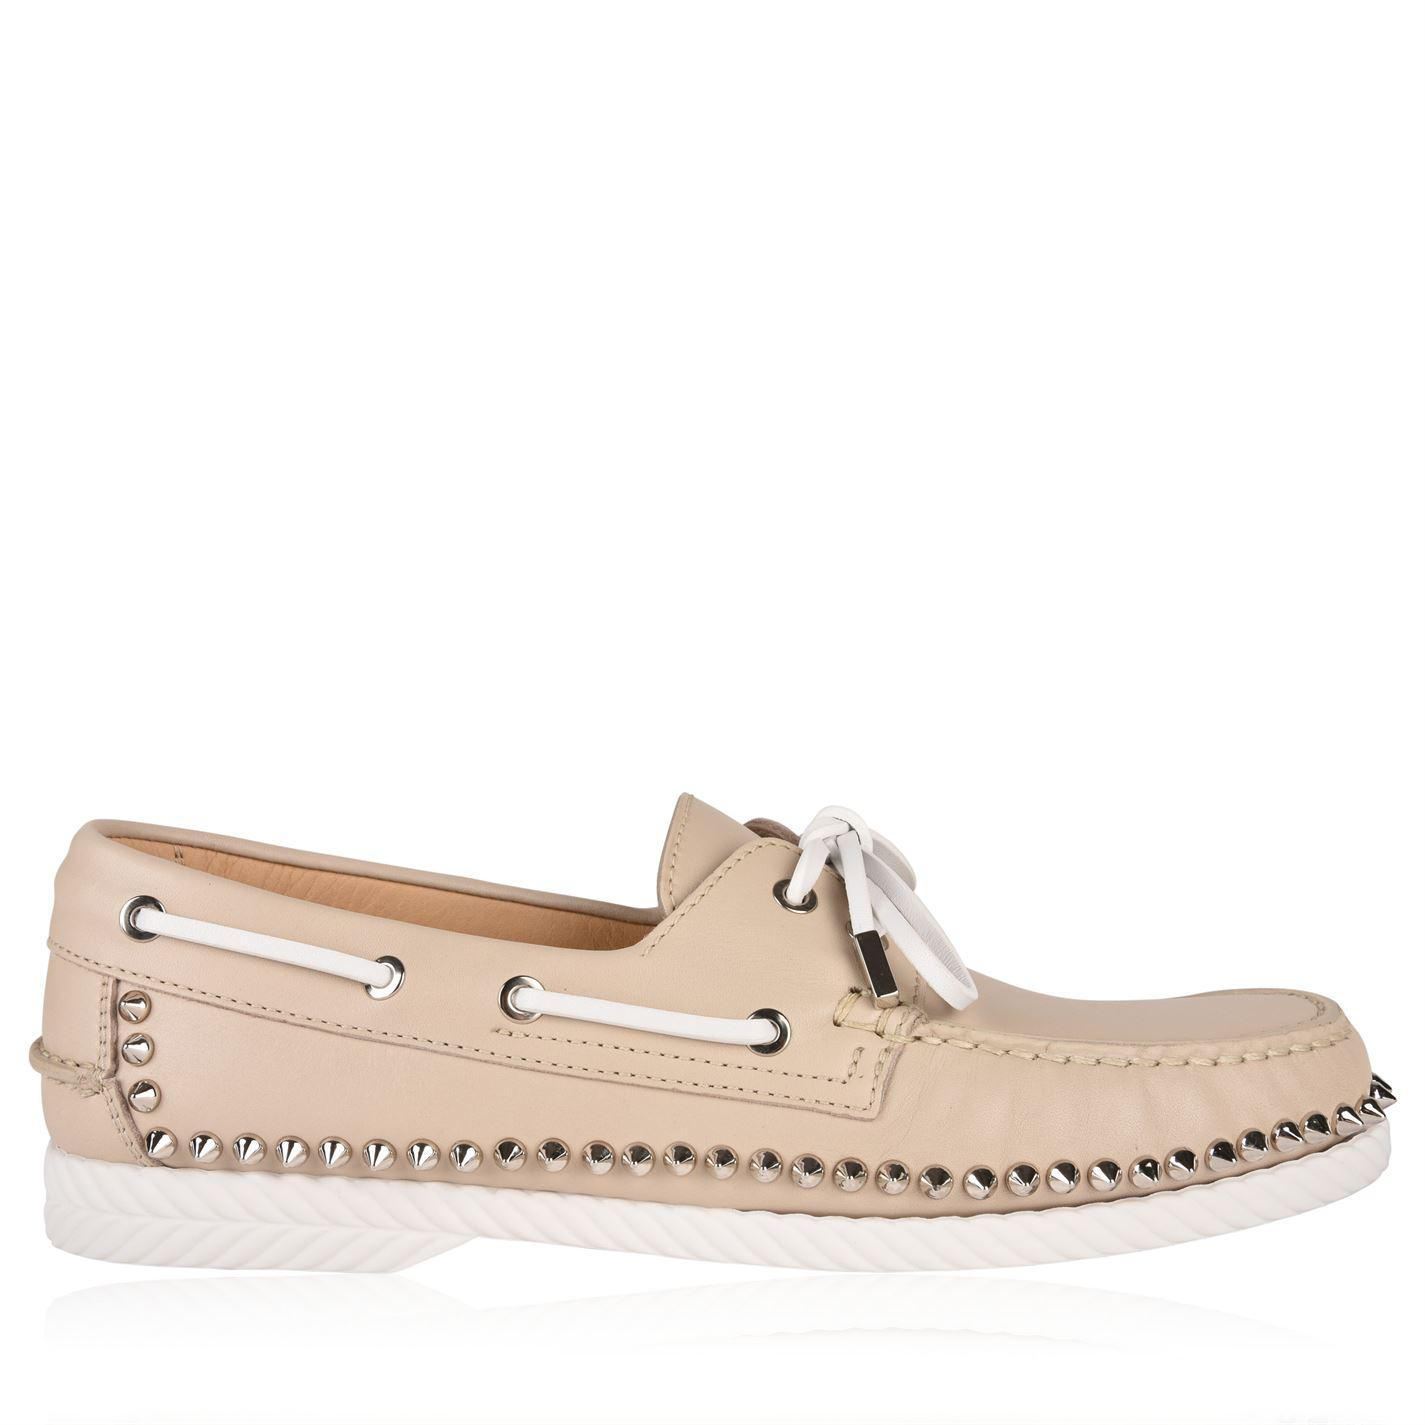 louboutin Boat Shoe